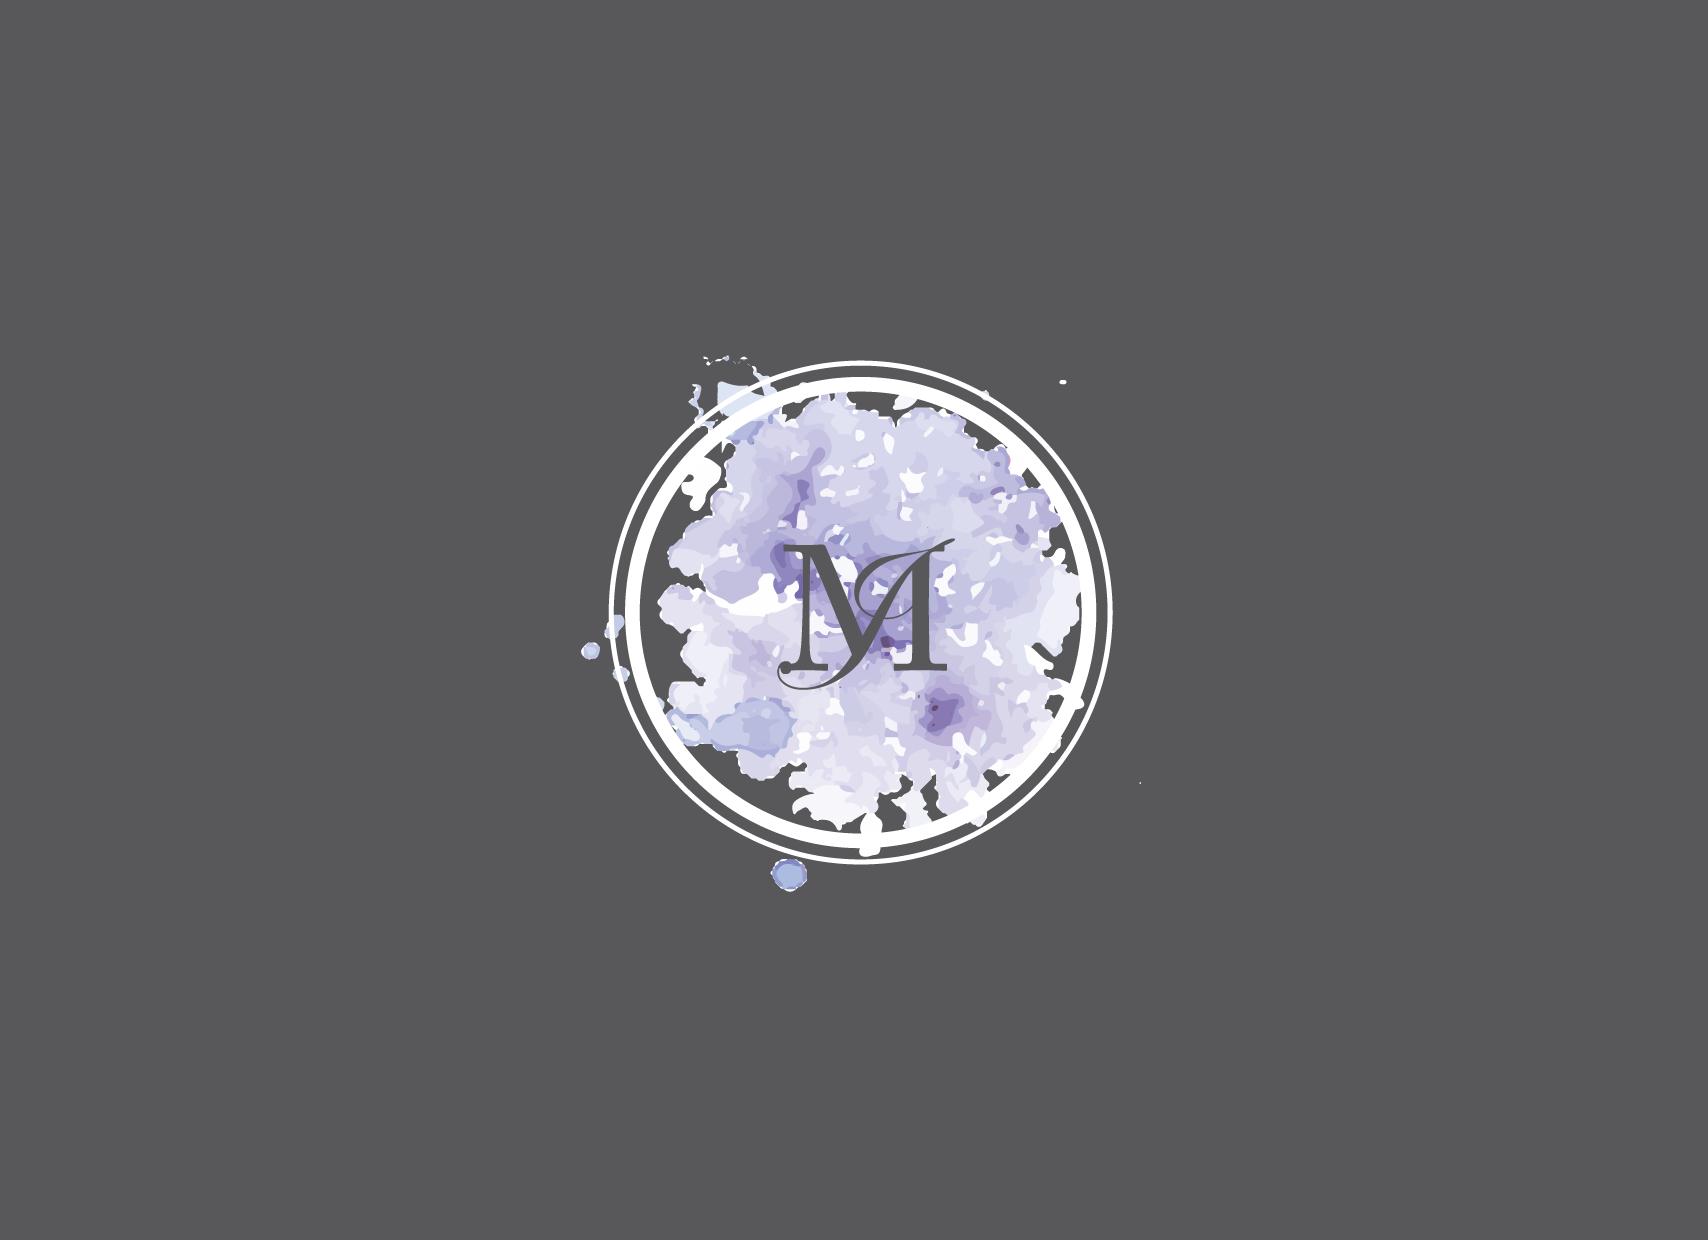 jm-claricegomesdesigns-wedding-monogram